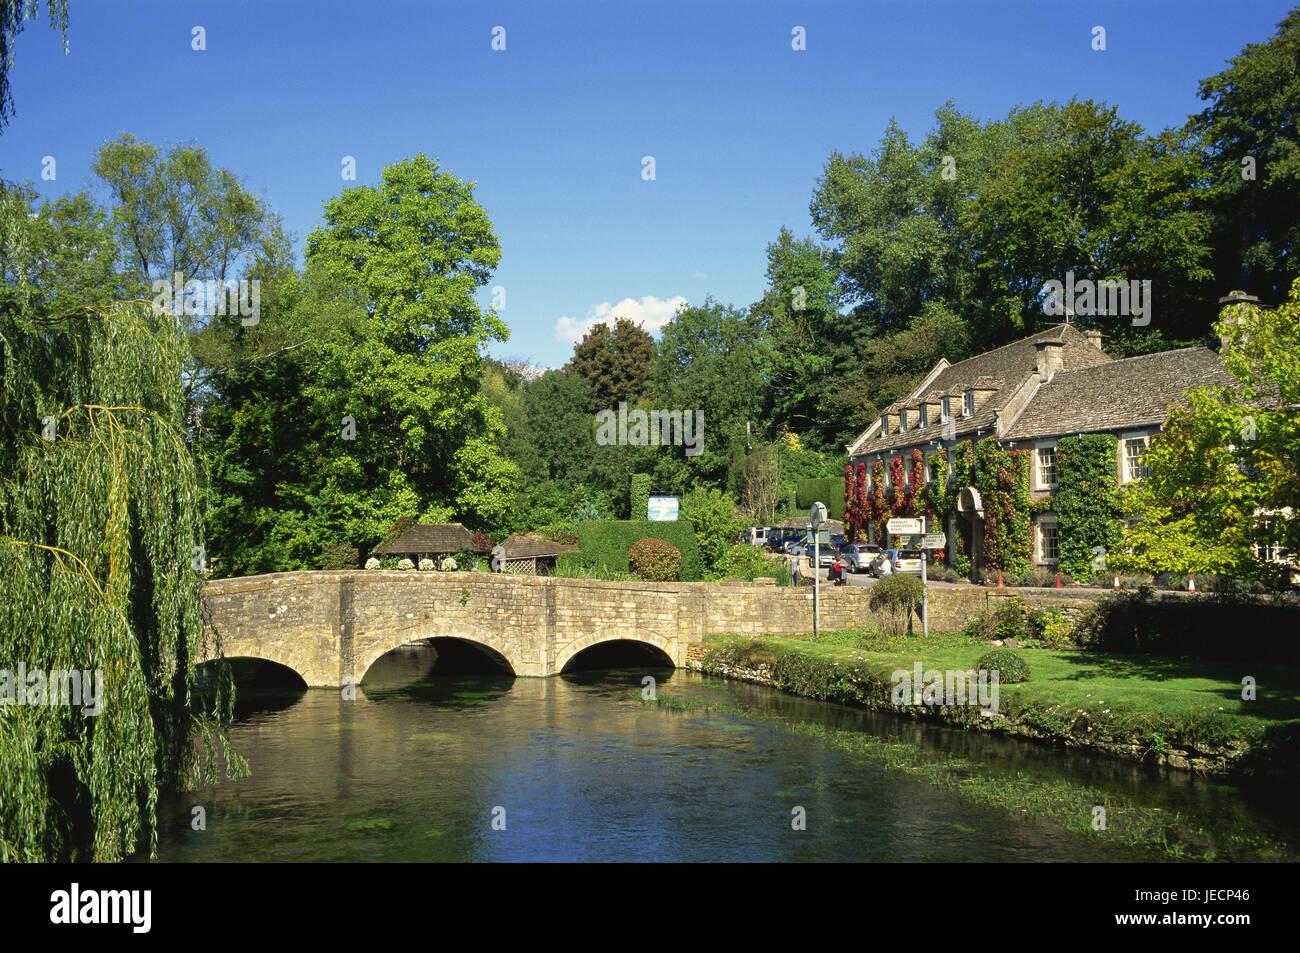 Great Britain, England, Gloustershire, Cotswolds, Bibury, bridge, river, Europe, destination, town, provincial town, - Stock Image